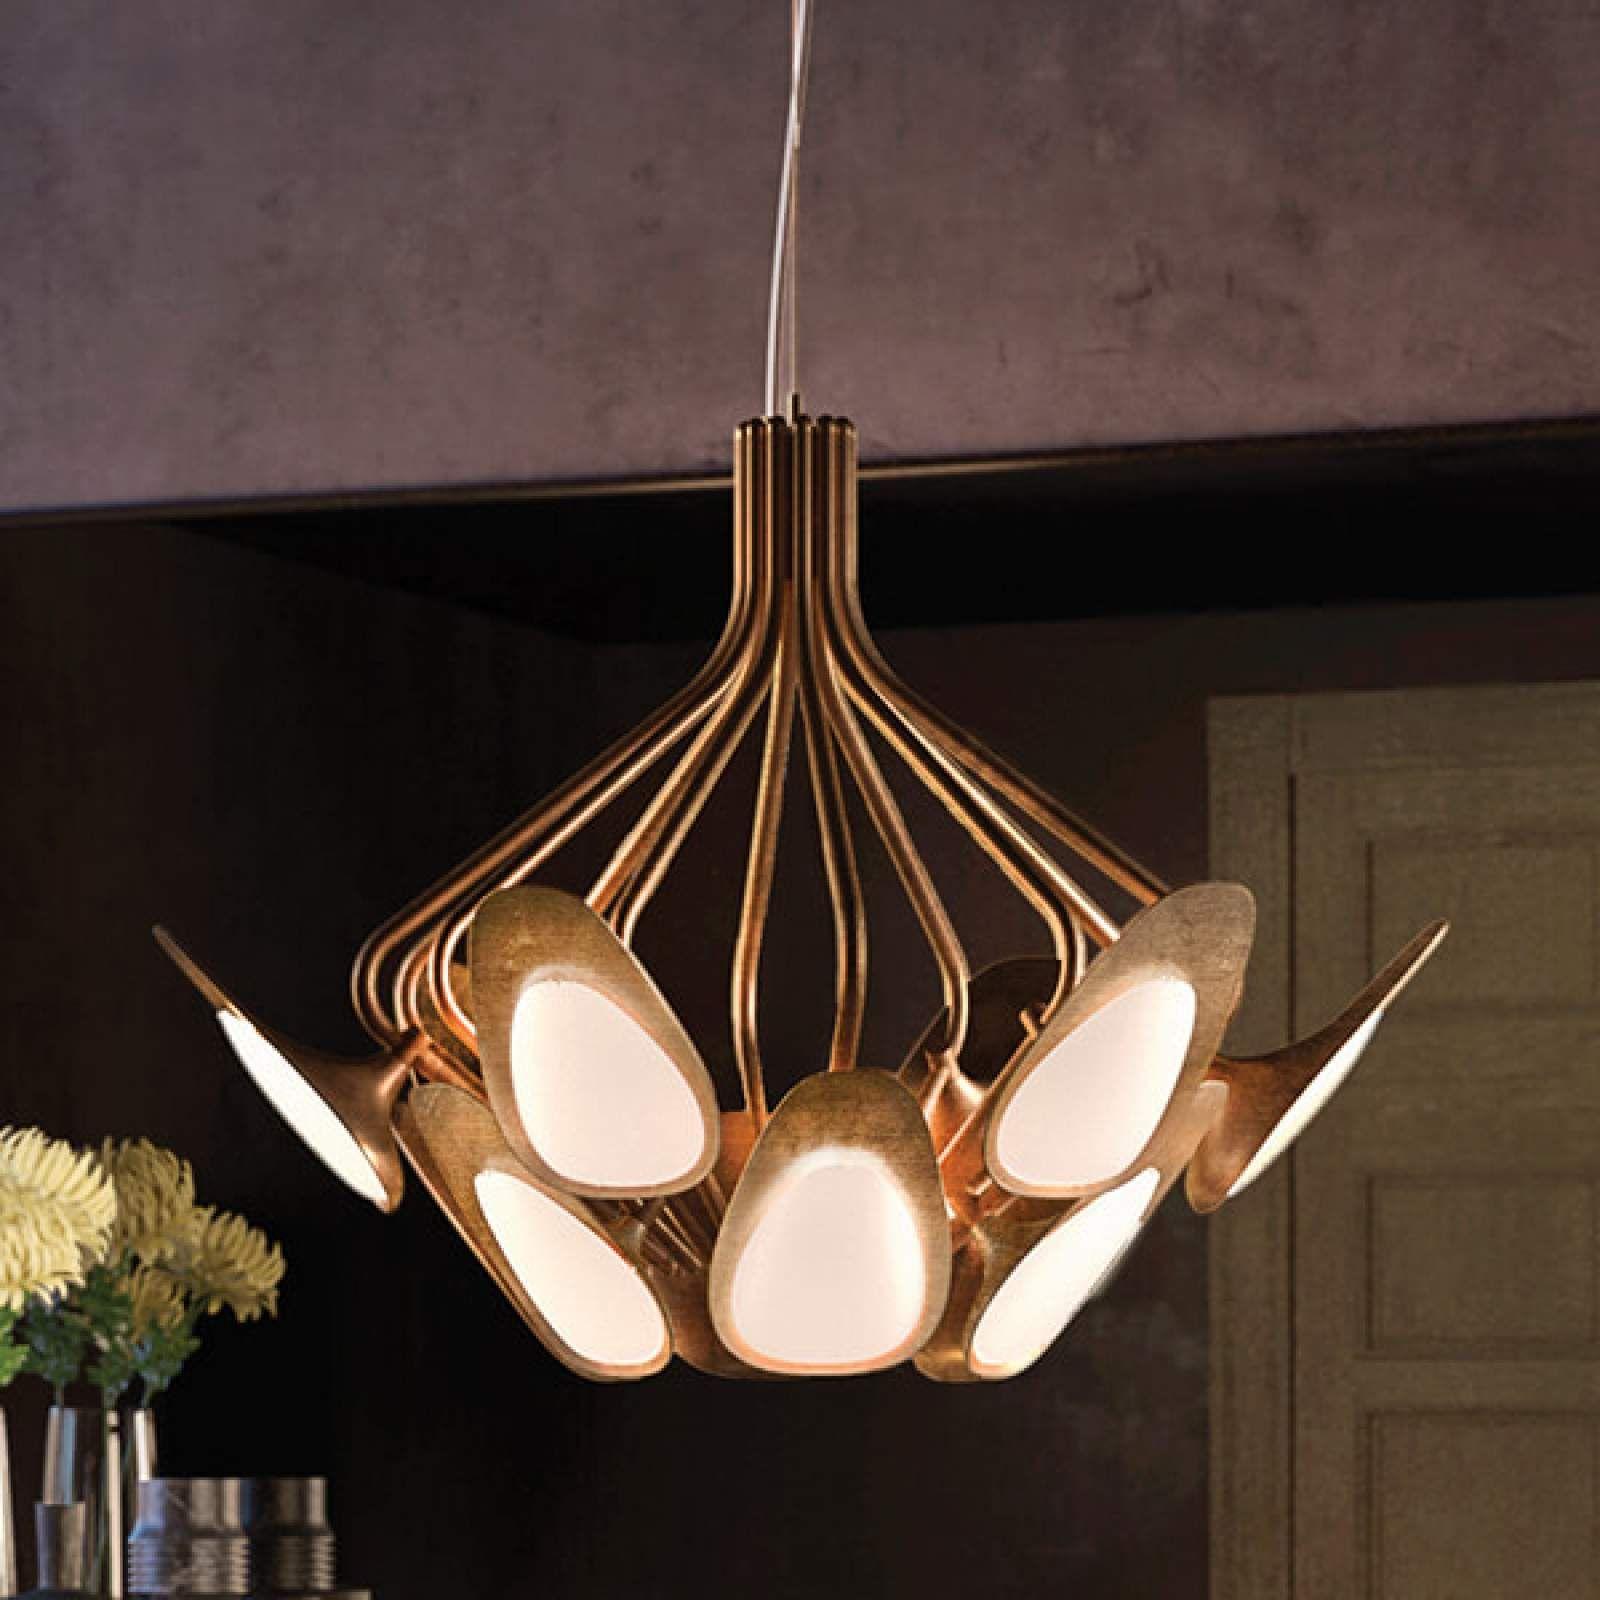 Kundalini Peacock   LED Hängeleuchte   Hanglamp, Hangende lichten, Moderne lampen